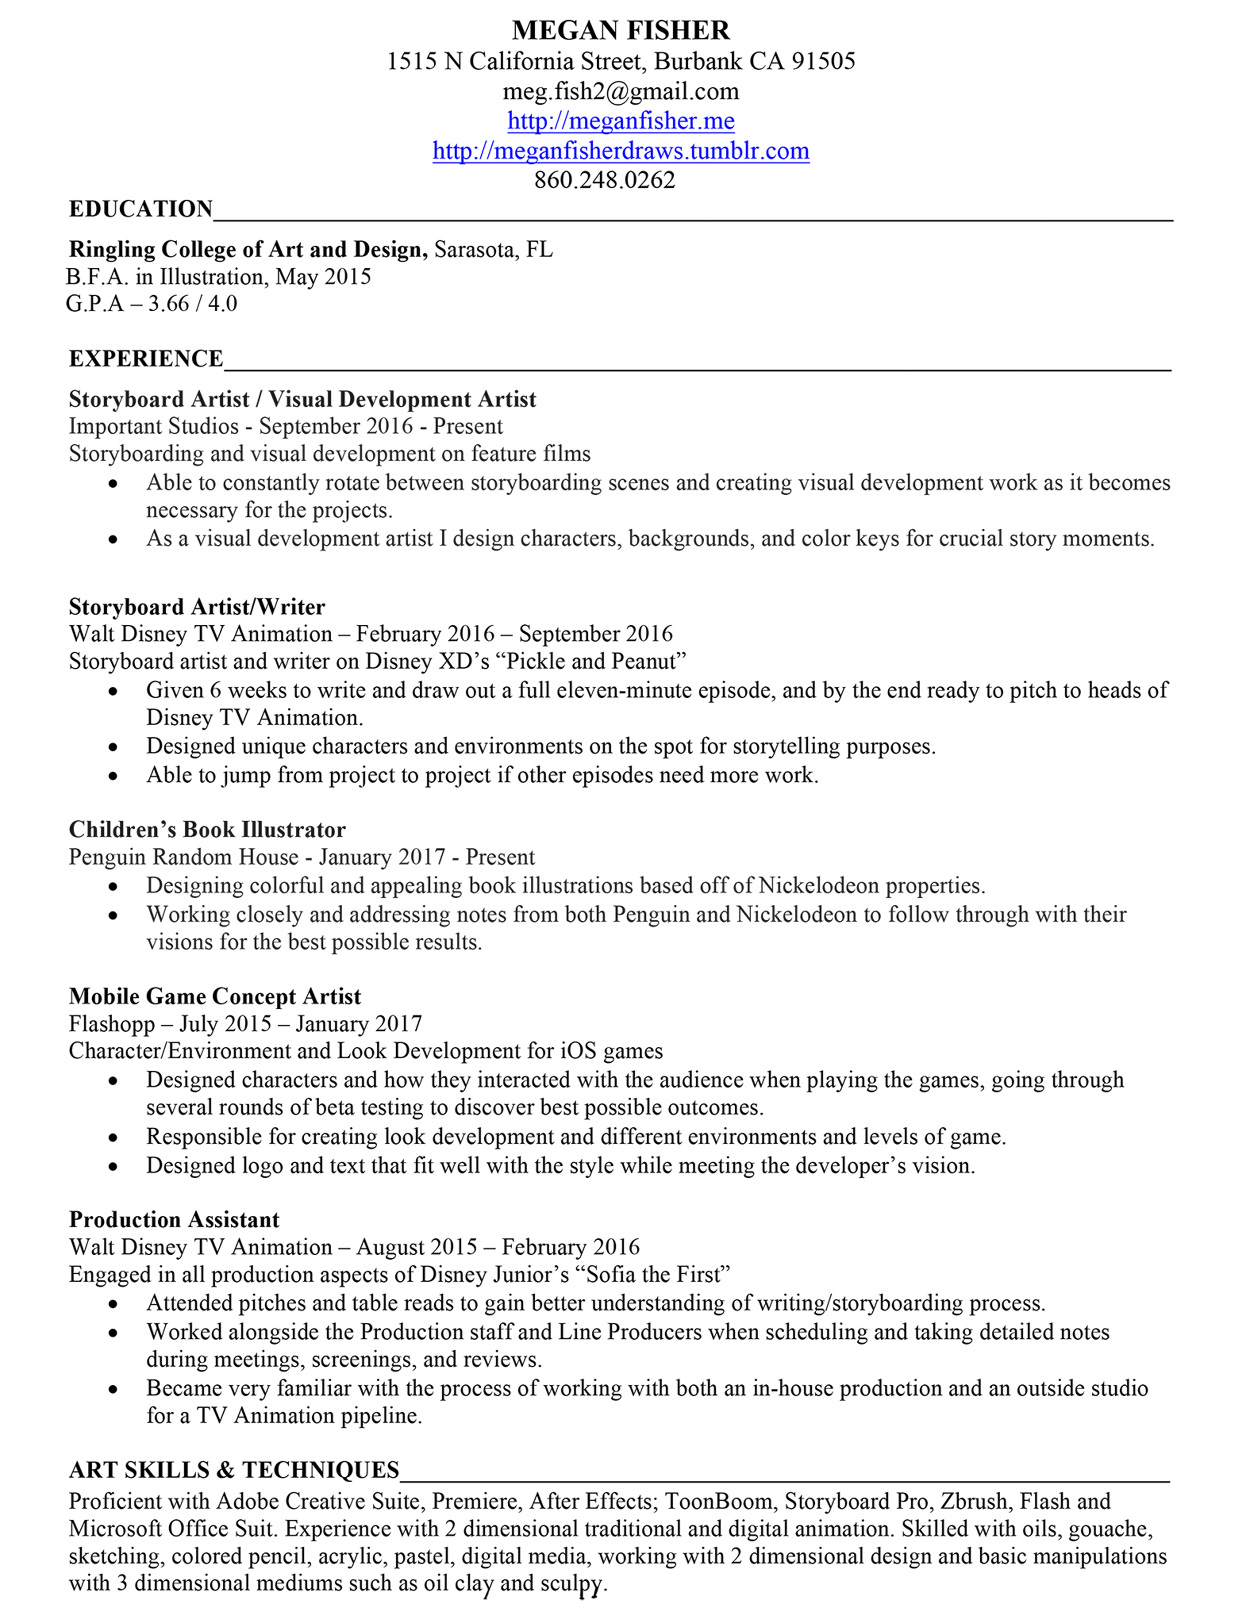 Disney College Program Resume Jaime Krzos Project Manager Homer 01 Jpg